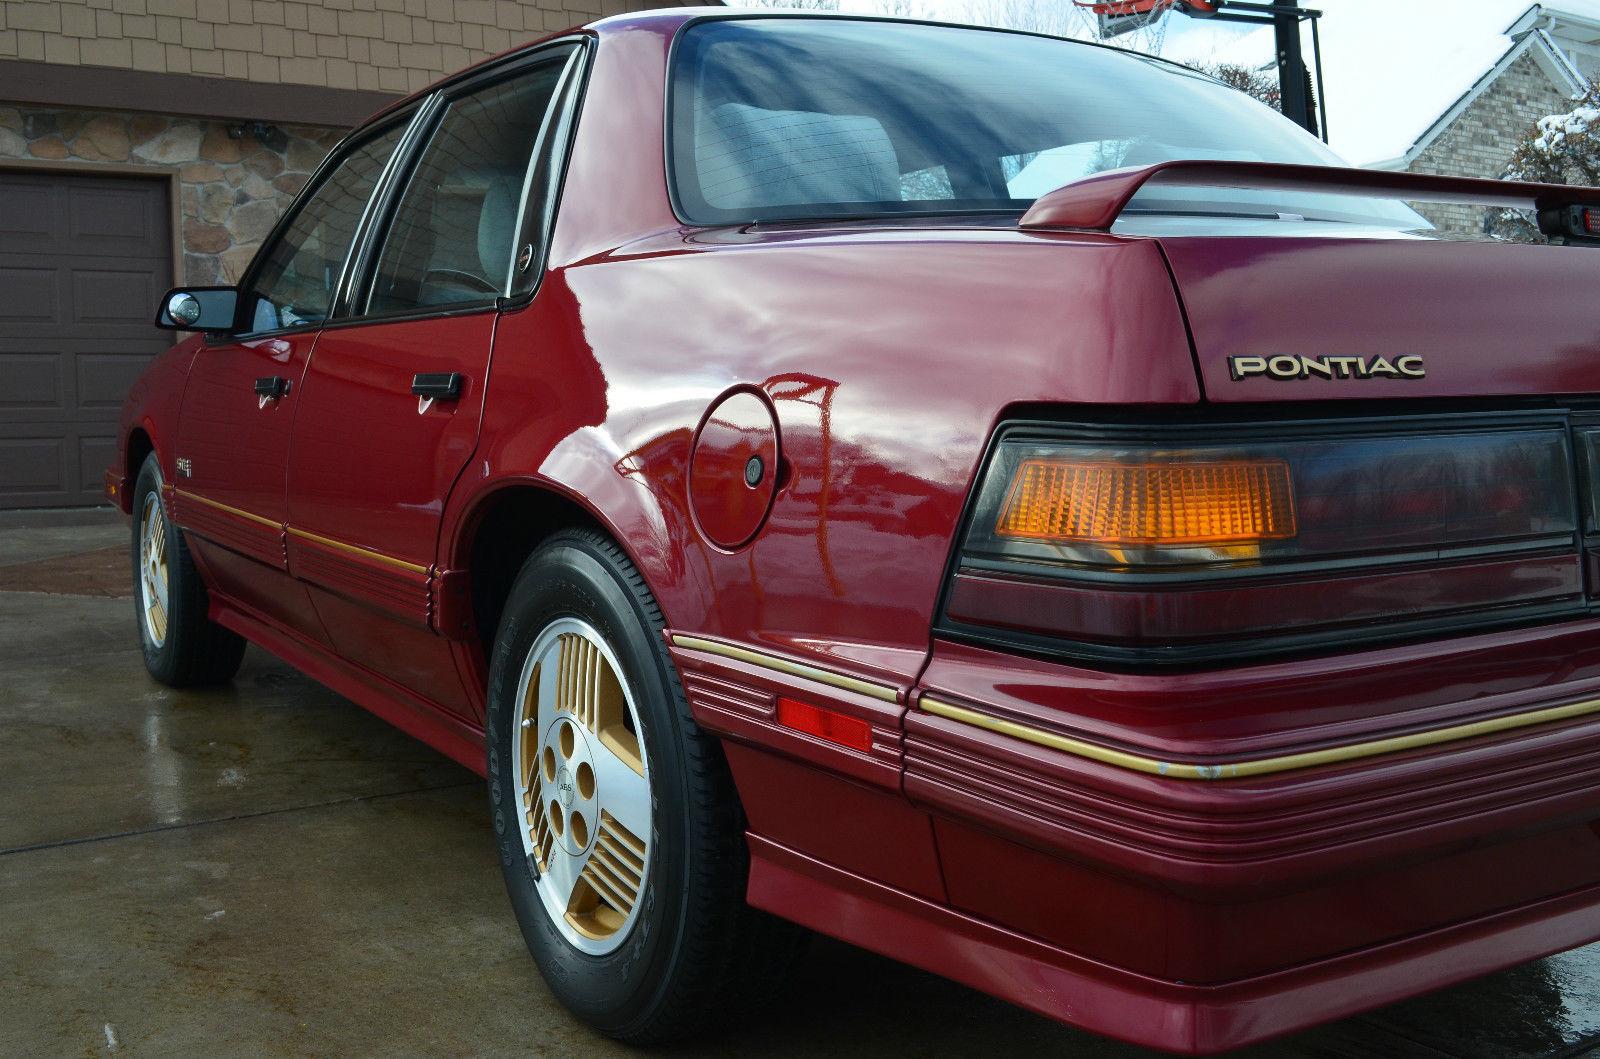 1989 Pontiac 6000 Ste All Wheel Drive Awd Sedan 4 Door 3